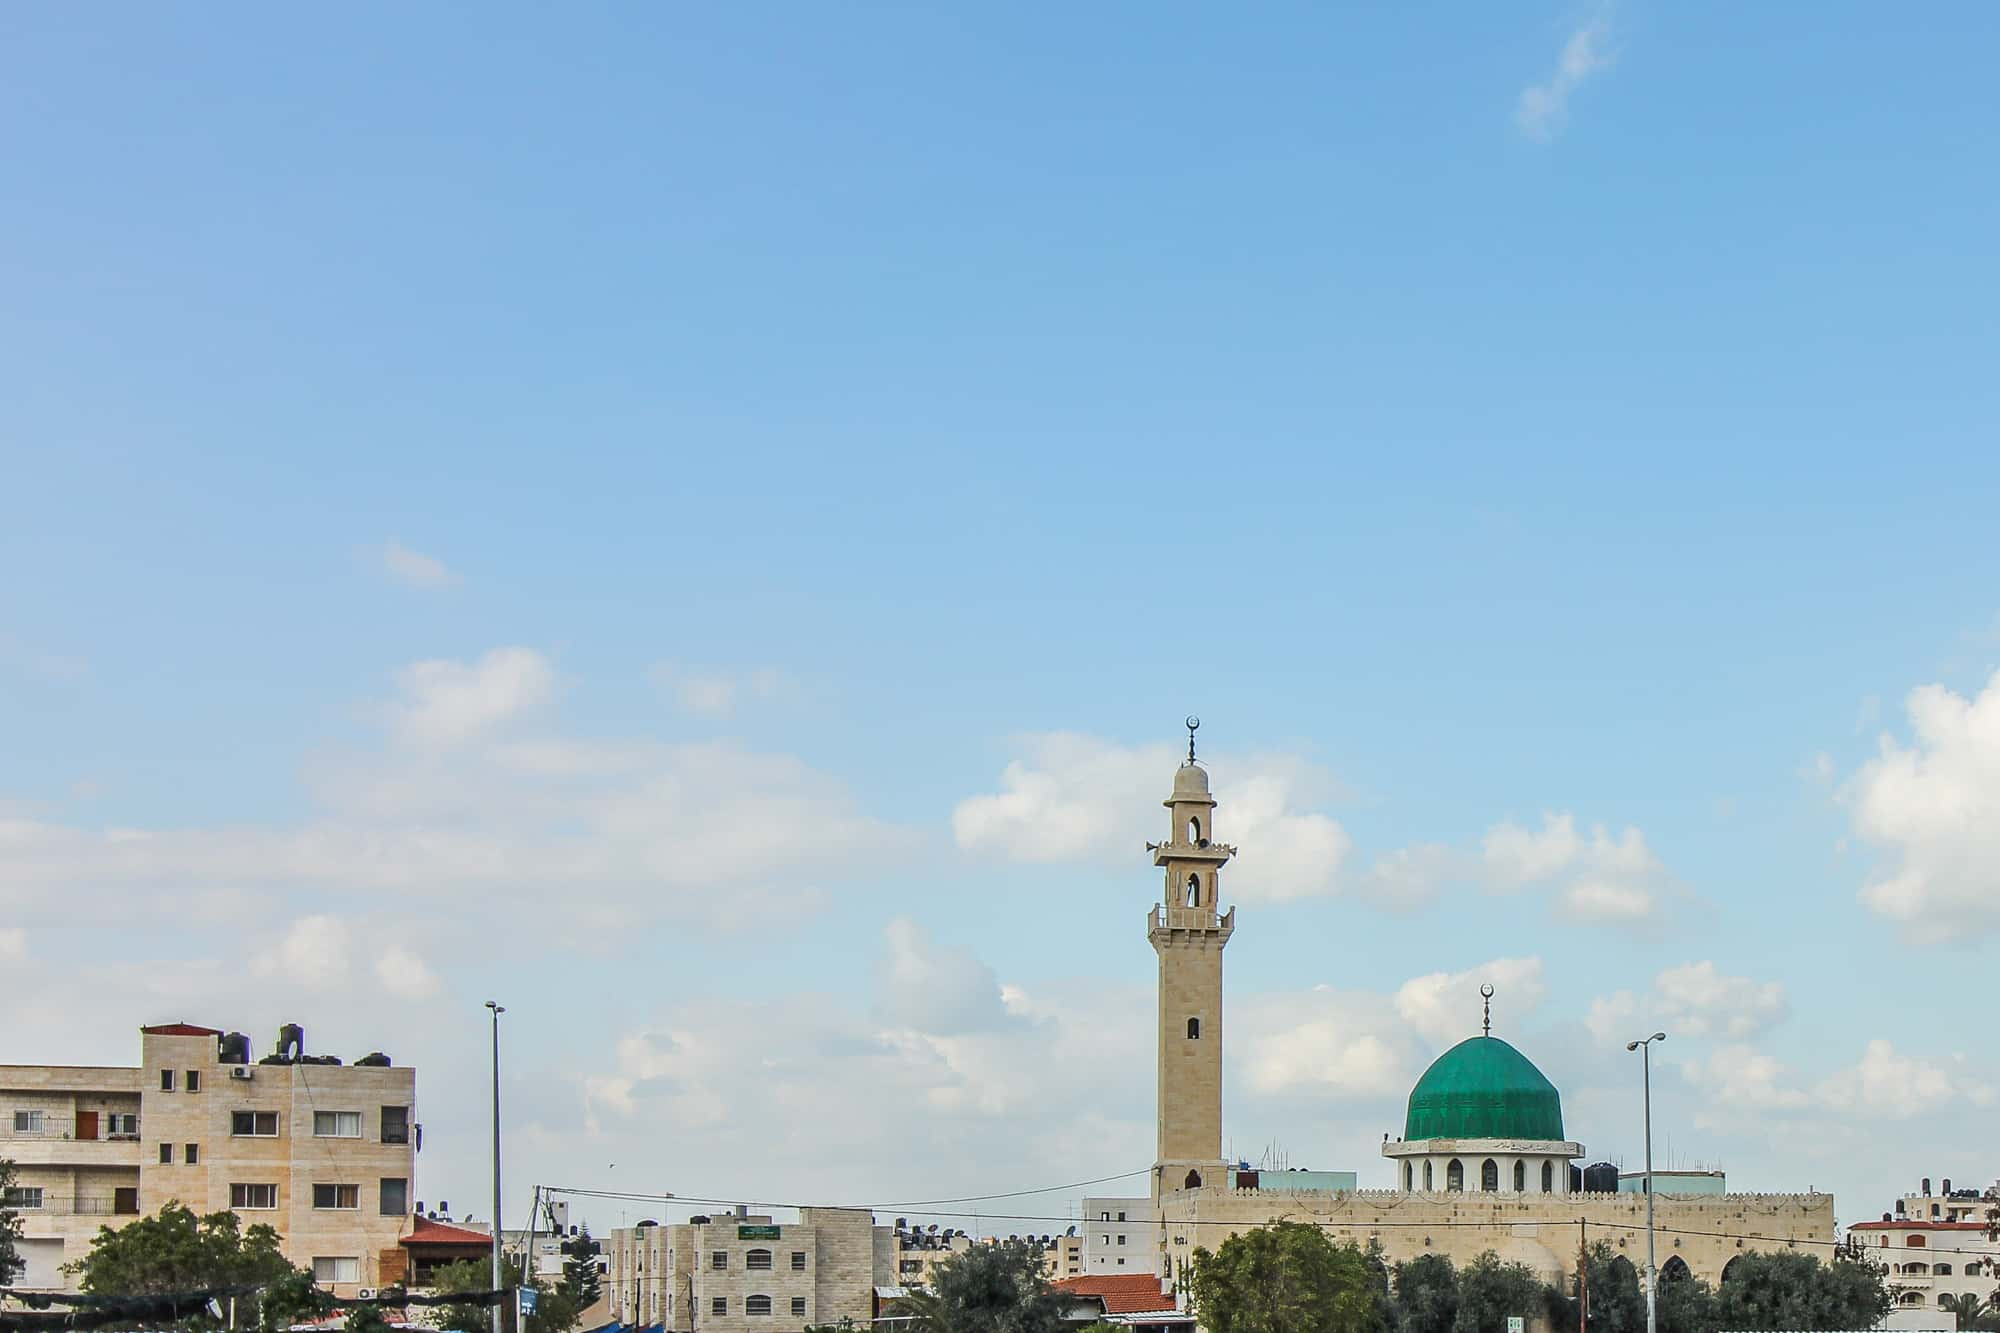 Nablus und Jenin Tour Stopp 5: Die Stadt Jenin